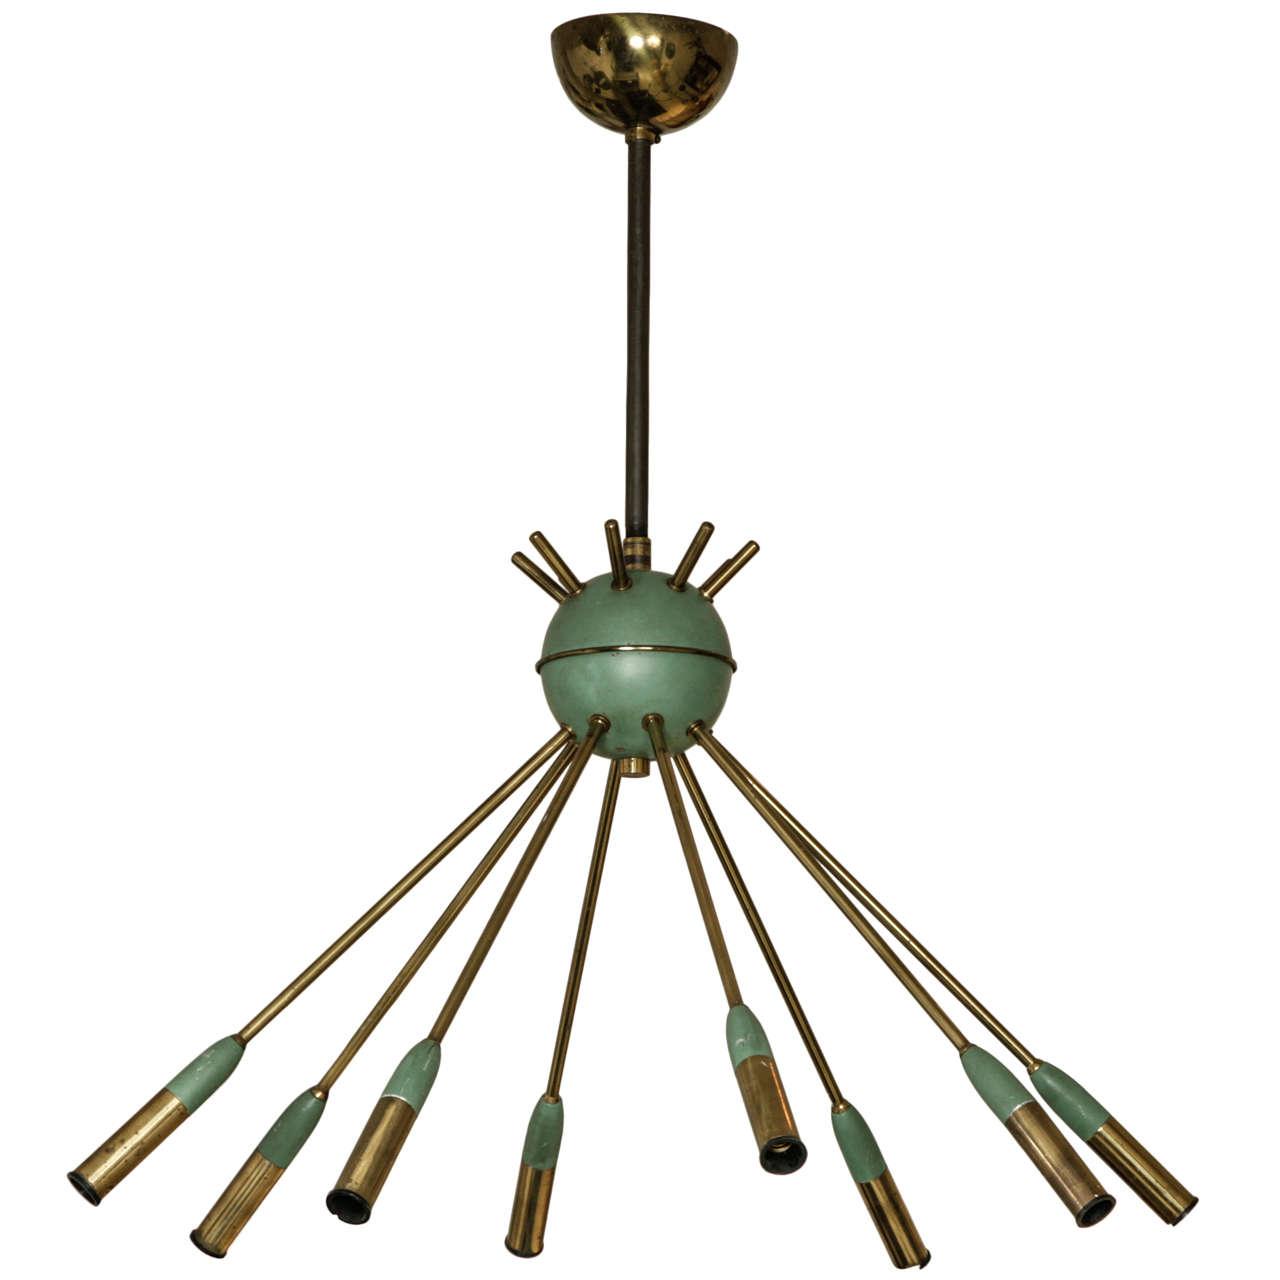 Italian design mid century ceiling light at 1stdibs